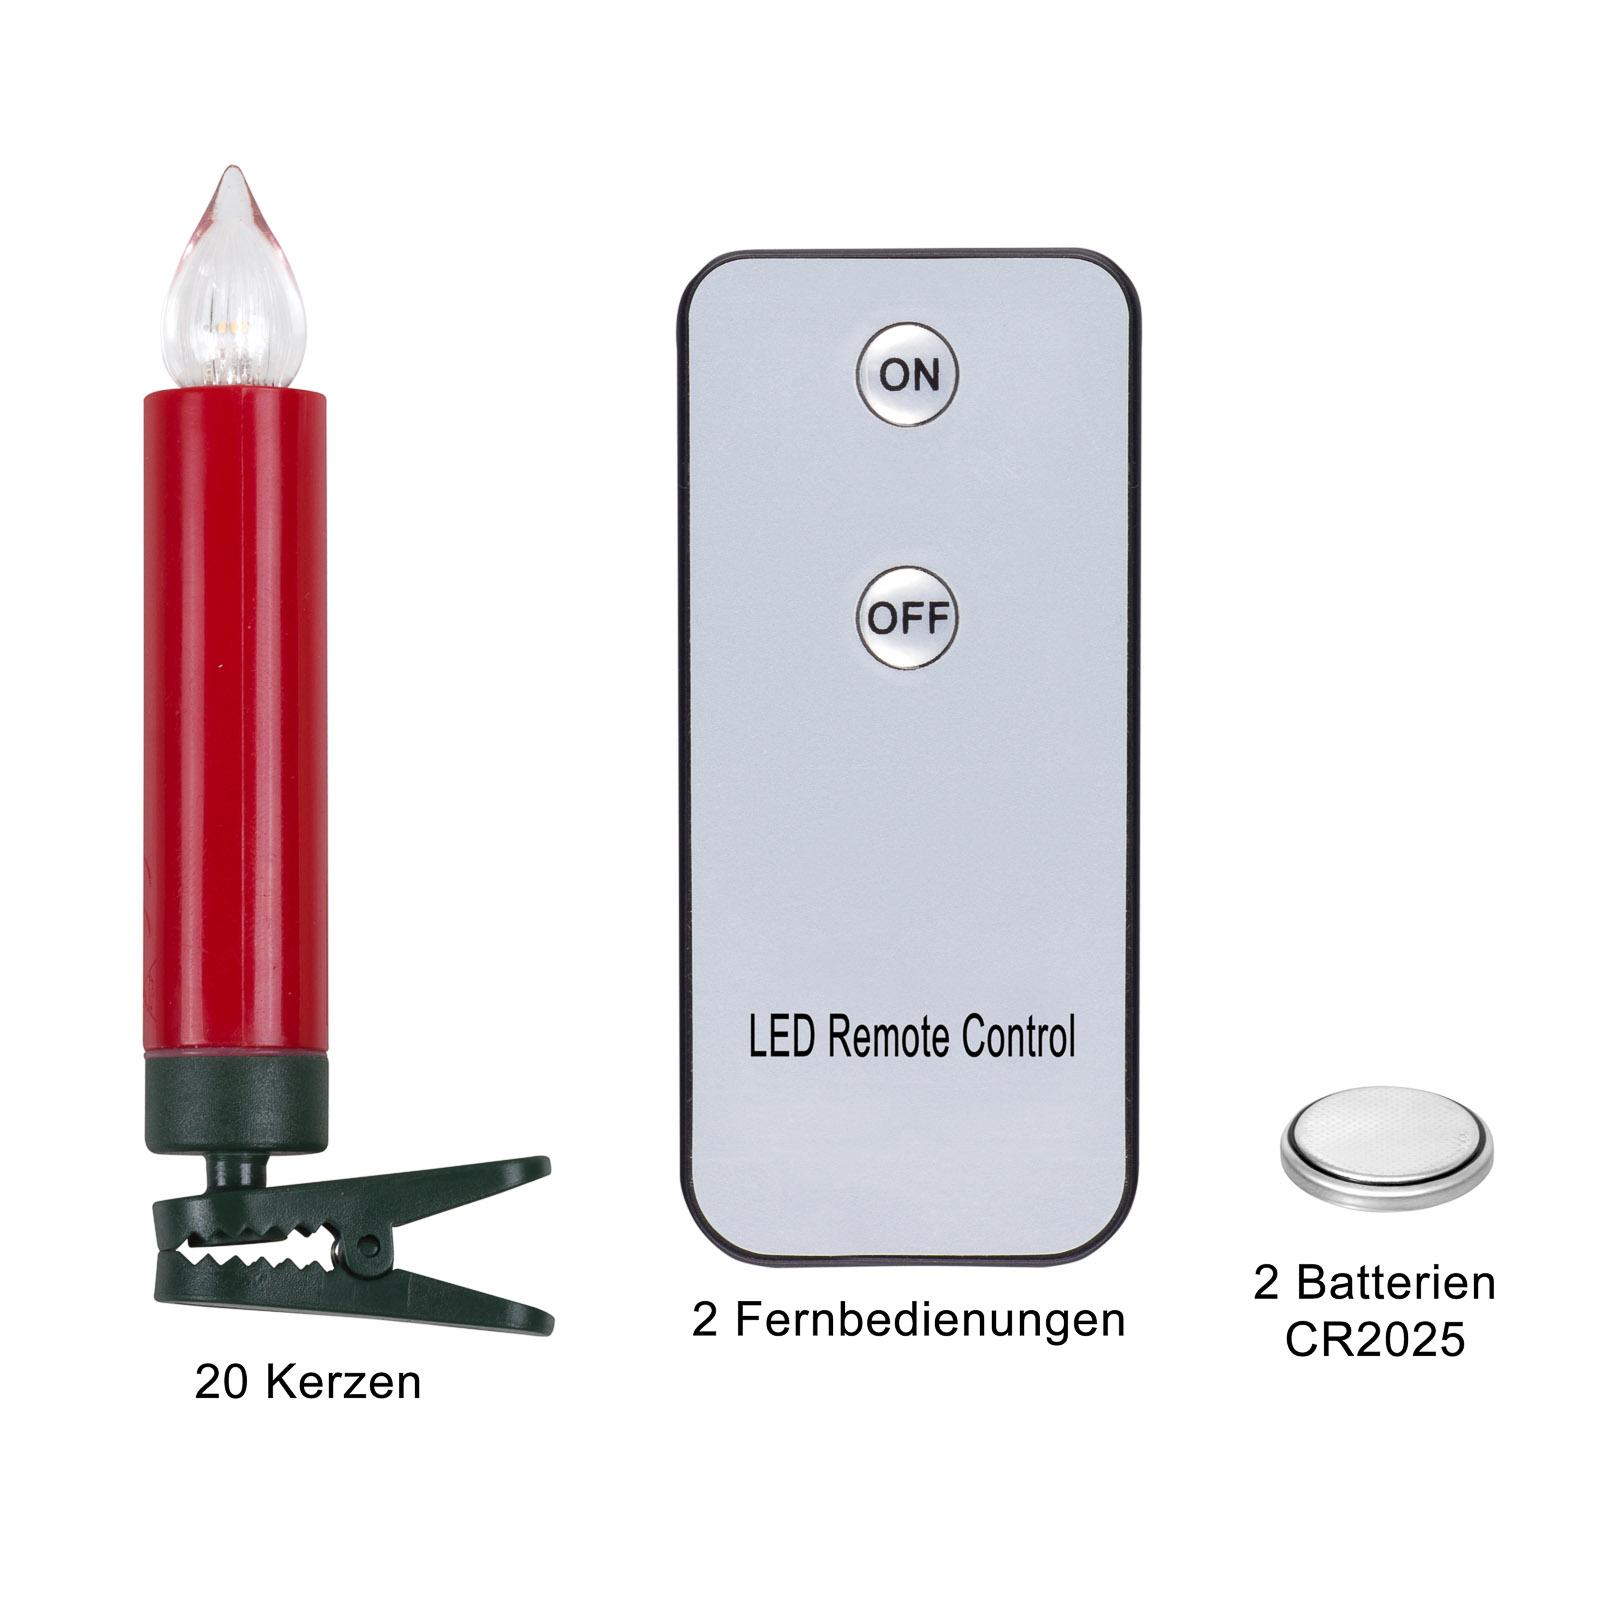 Kabellose Led Kerzen : kabellose rgb led kerzen weihnachtskerzen rot ebay ~ Watch28wear.com Haus und Dekorationen